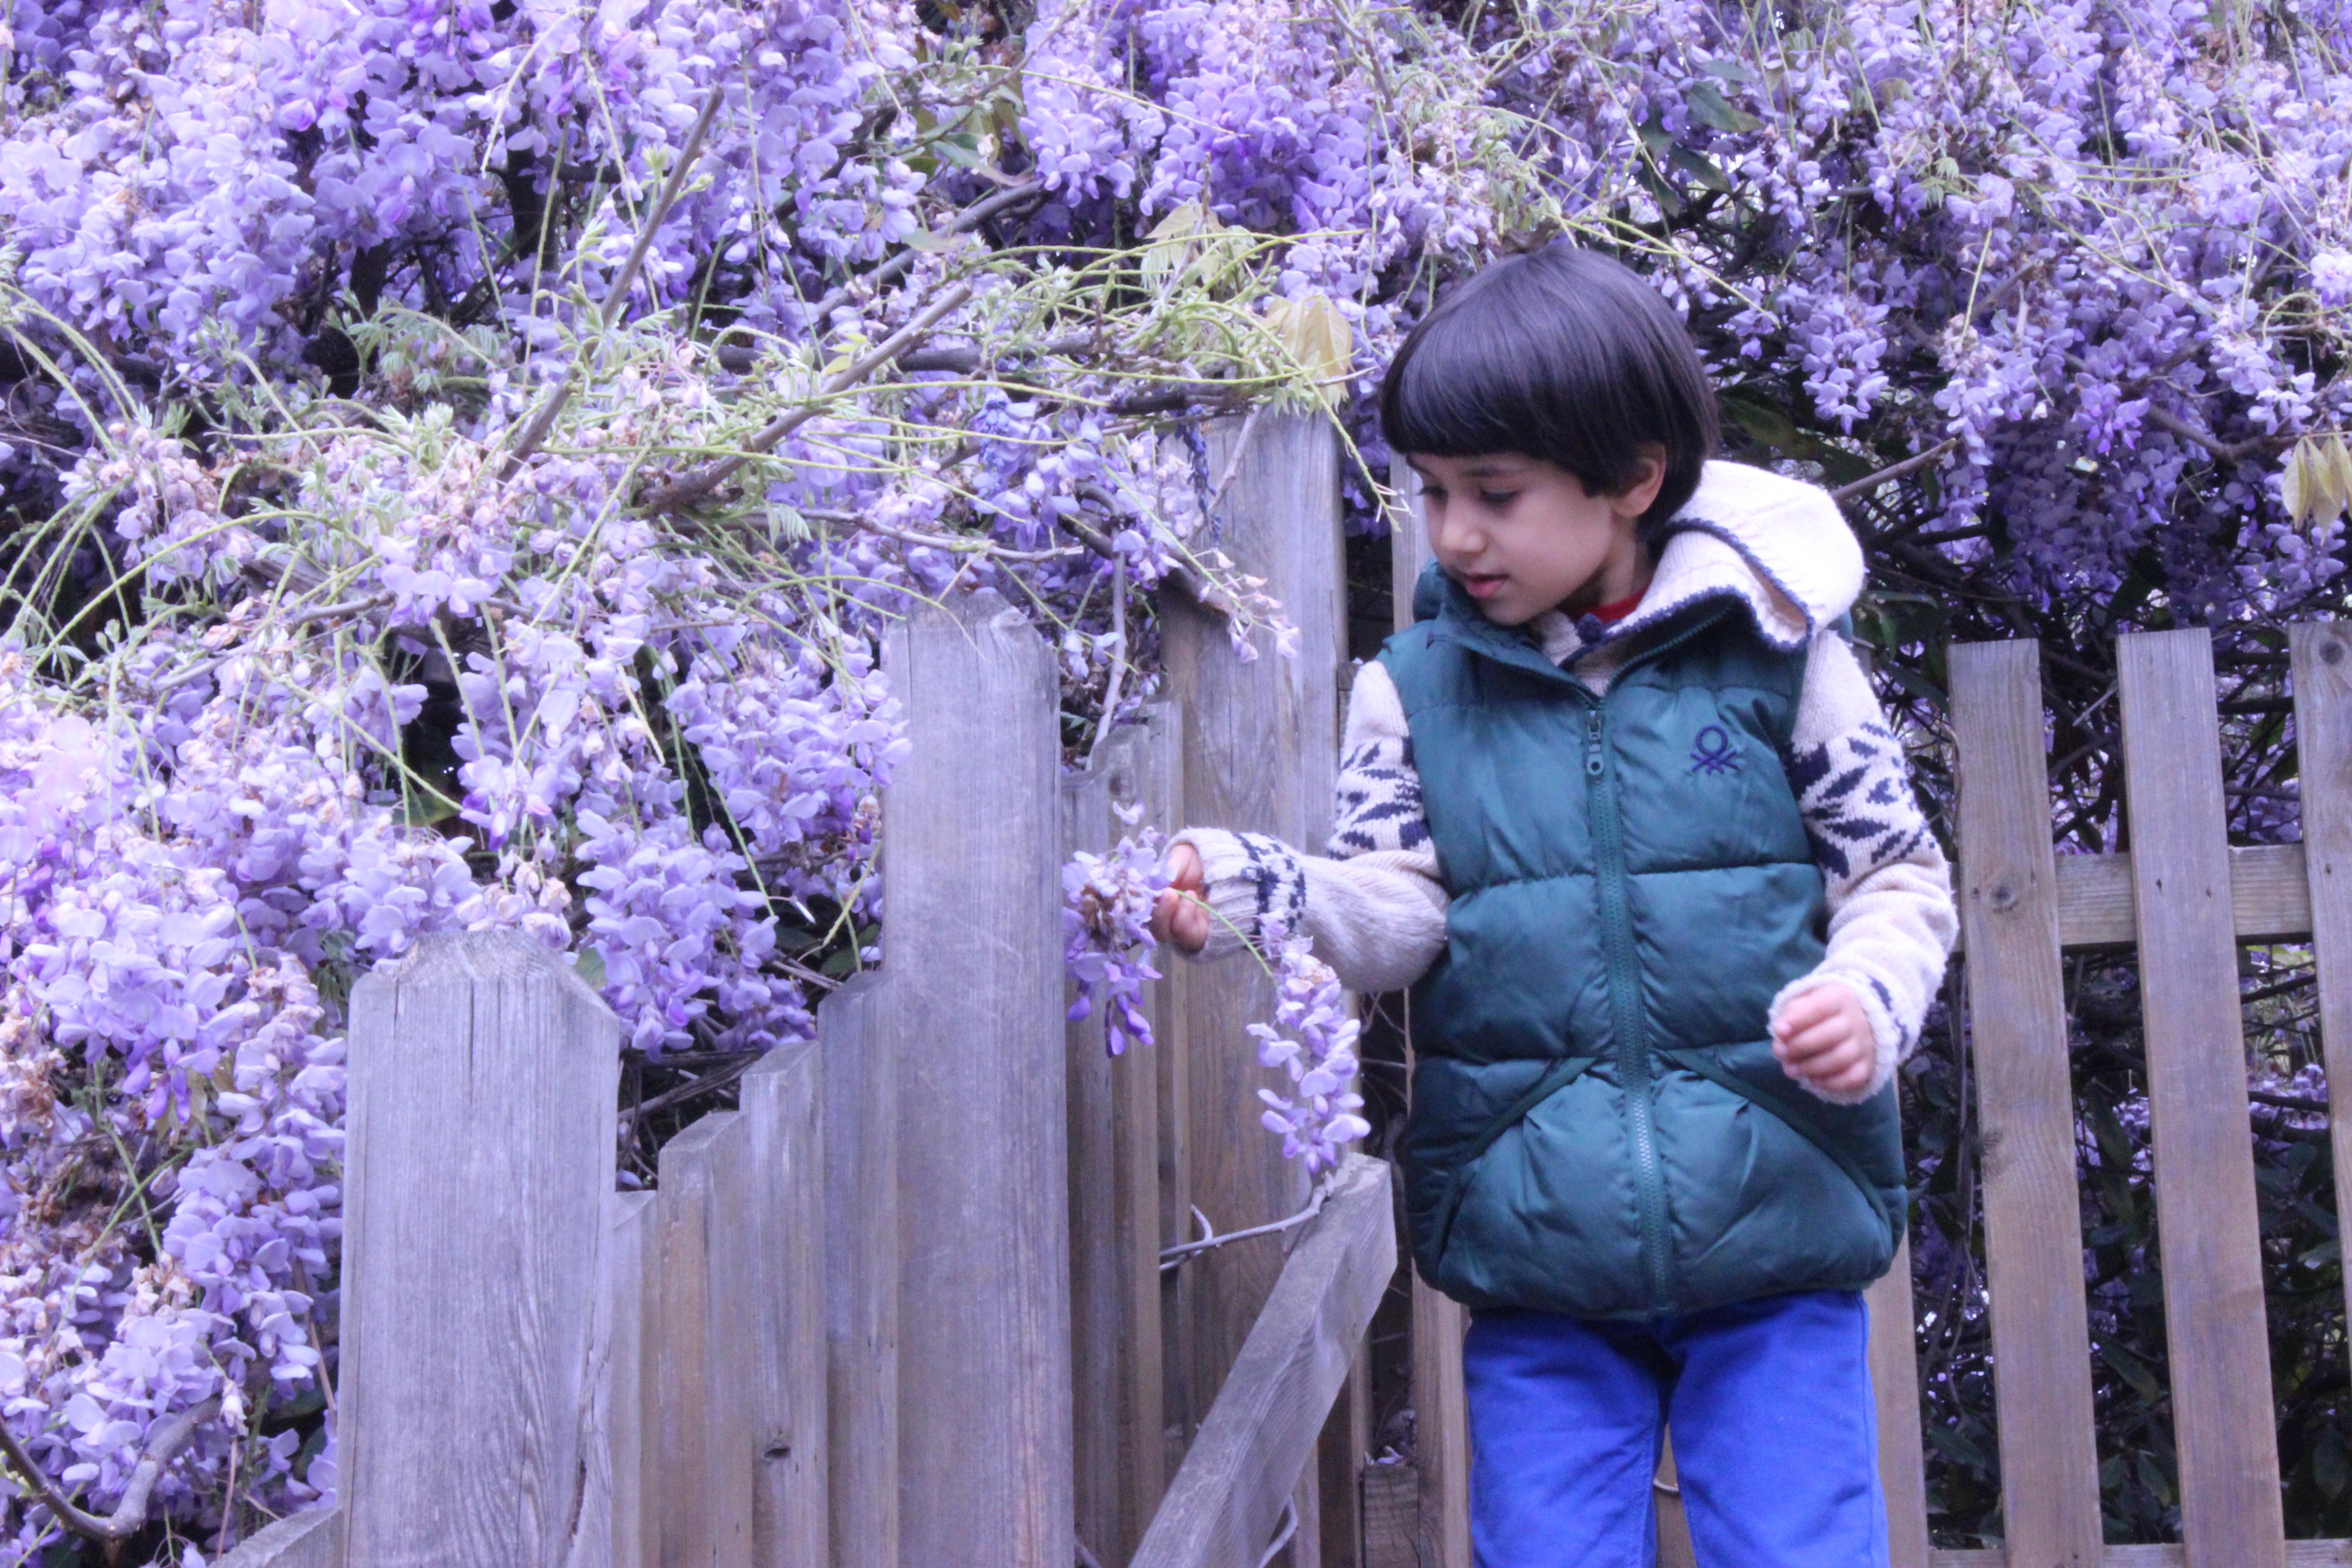 Gambar Warna Lembayung Muda Bunga Ungu Menanam Musim Semi Botani Wisteria Pohon Lavender Inggris Tanaman Berbunga Mekar Delphinium Taman Belukar 5184x3456 M Murat Ataman 1592517 Galeri Foto Pxhere